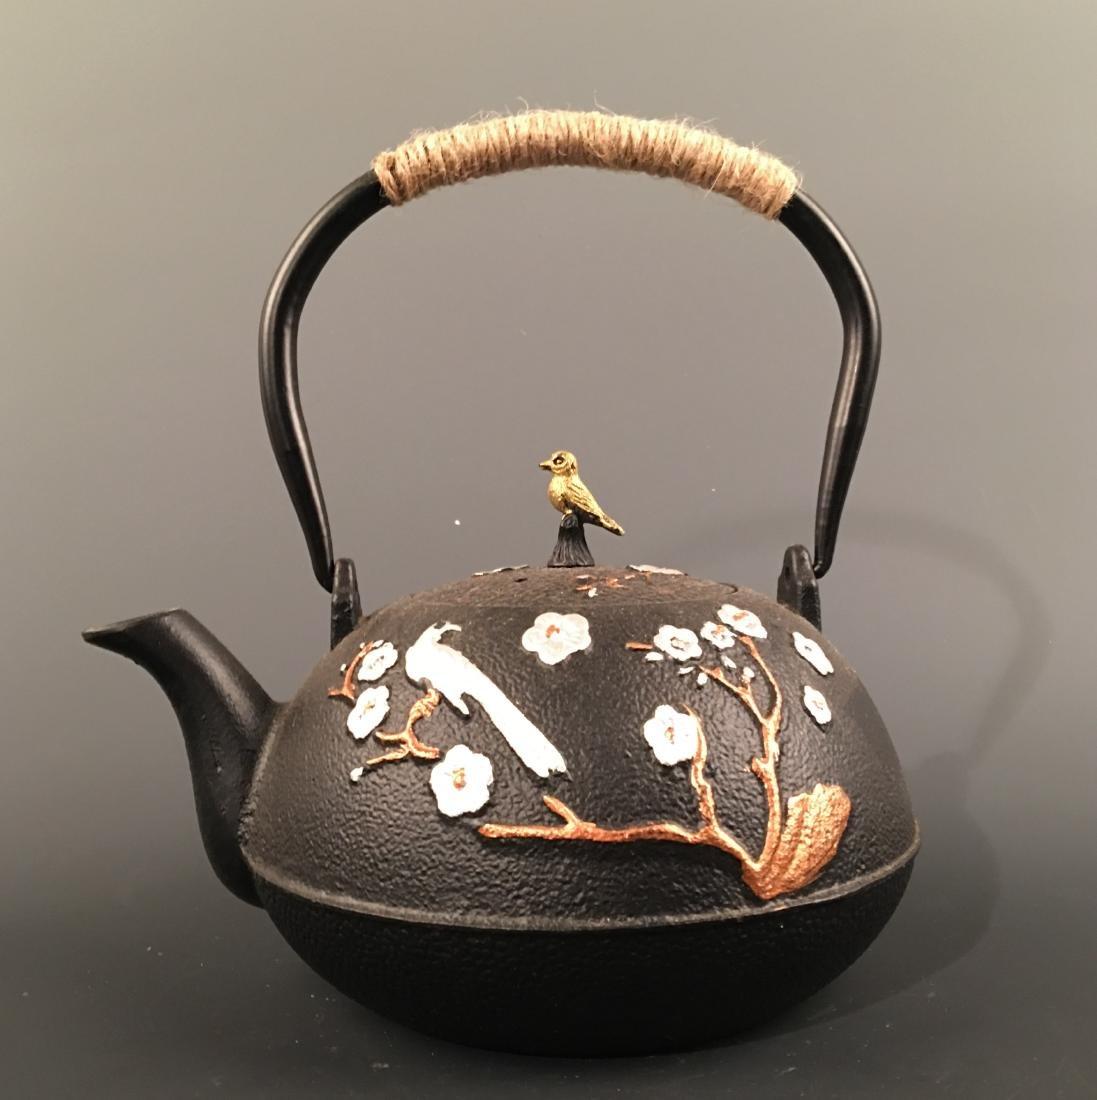 Chinese Iron 'Bird & Flower' Teapot